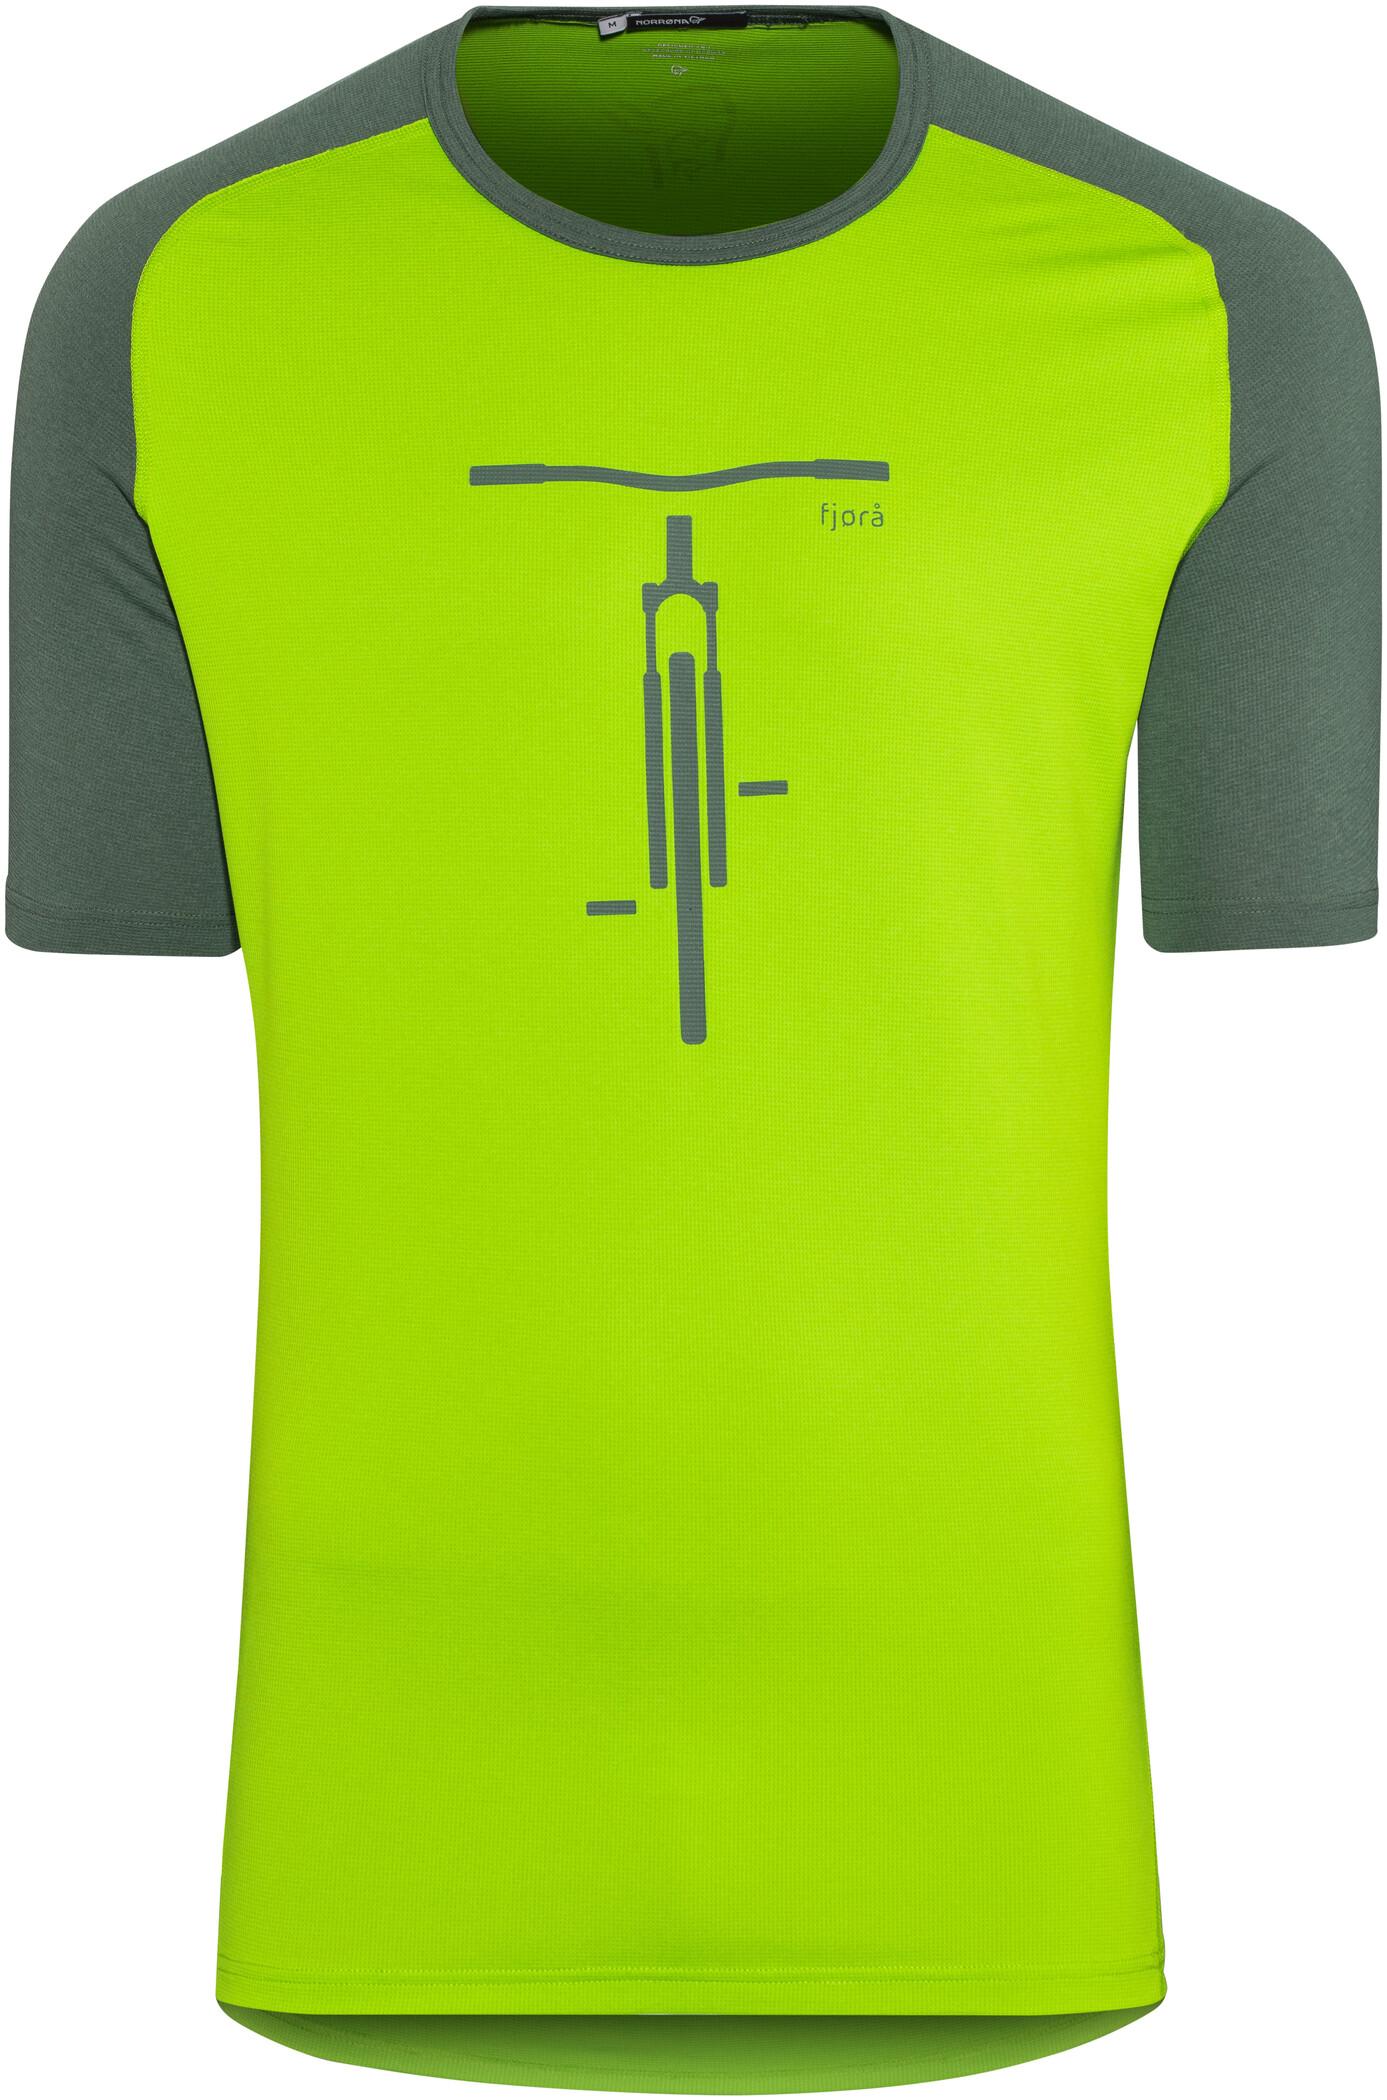 Norrøna Fjørå Equaliser Lightweight T-shirt Herrer, bamboo green (2019)   Jerseys